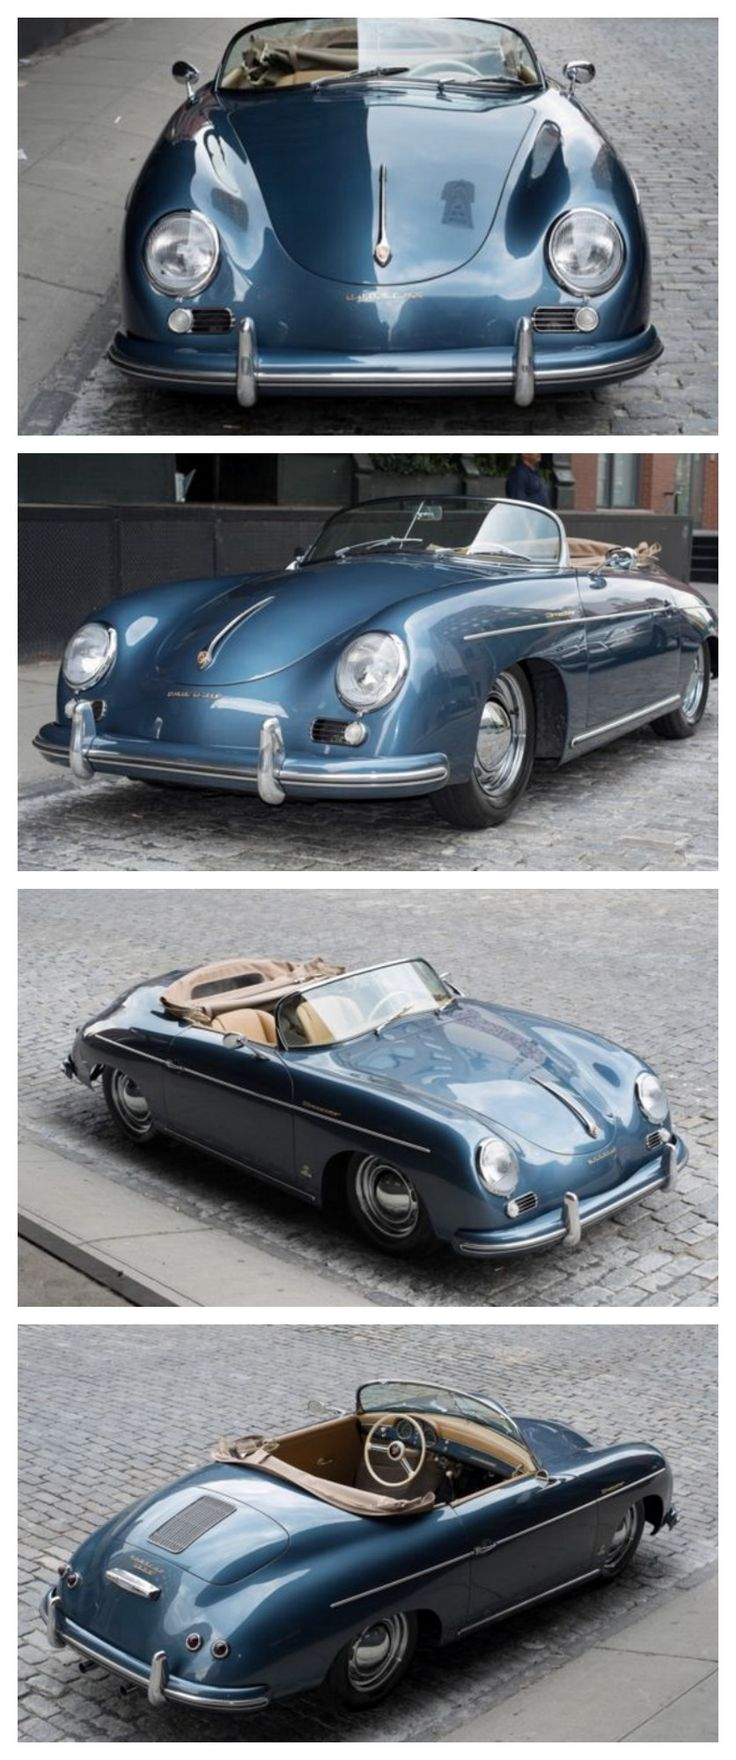 Simply Stunning! Porsche 356 Speedster #AutoAwesome